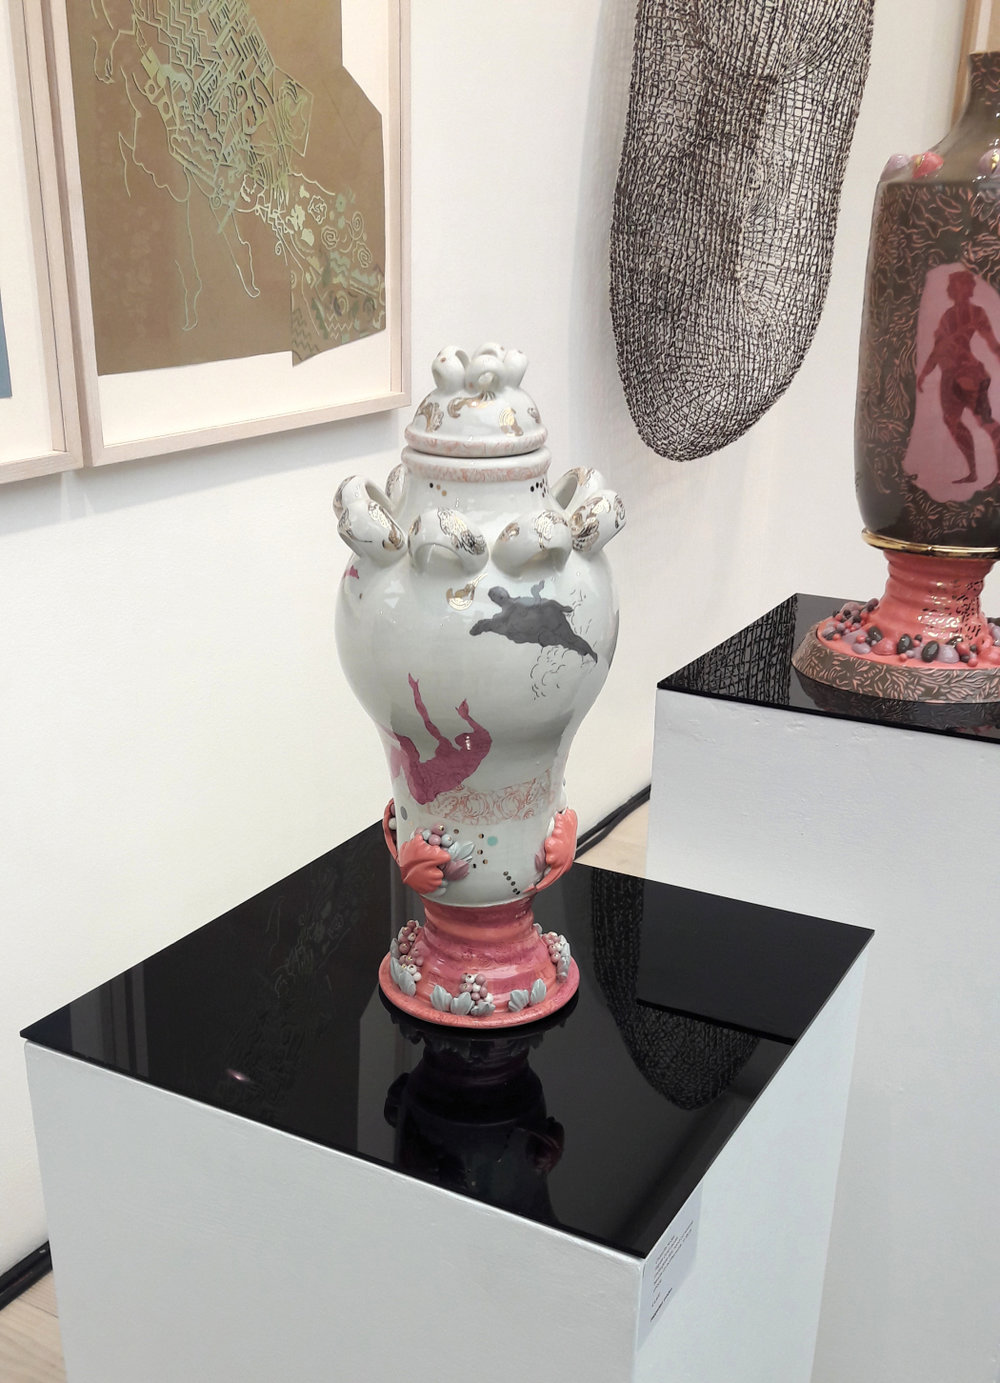 Collect 2018, Jaggeddart Charlotte Hodes Filigree Gold Leaves Underglaze slips, hand cut enamel transfer on earthenware